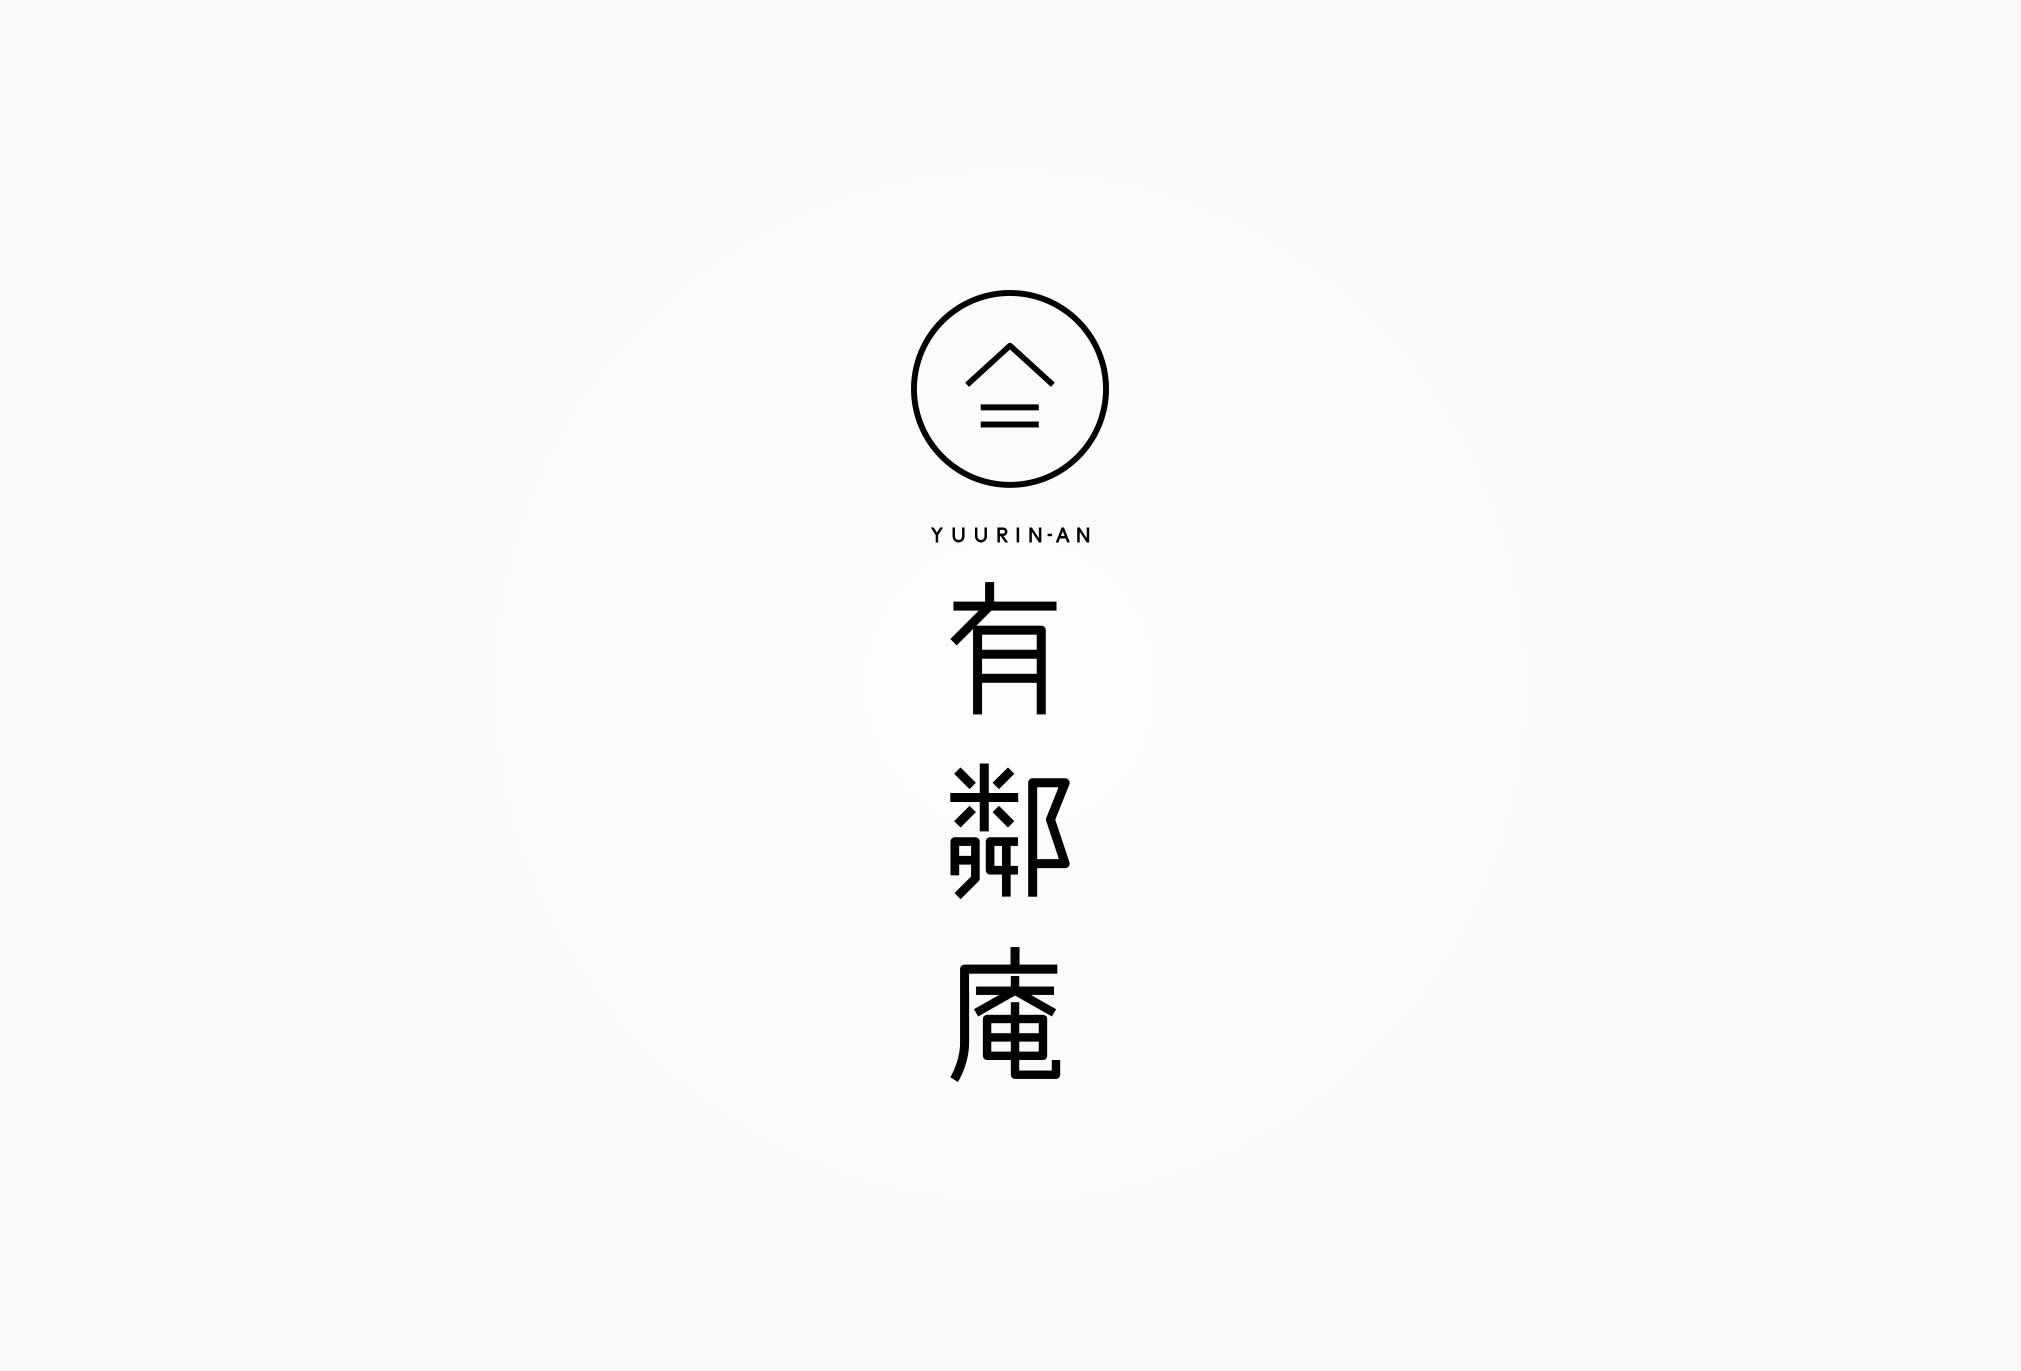 yuurin-an_logo2